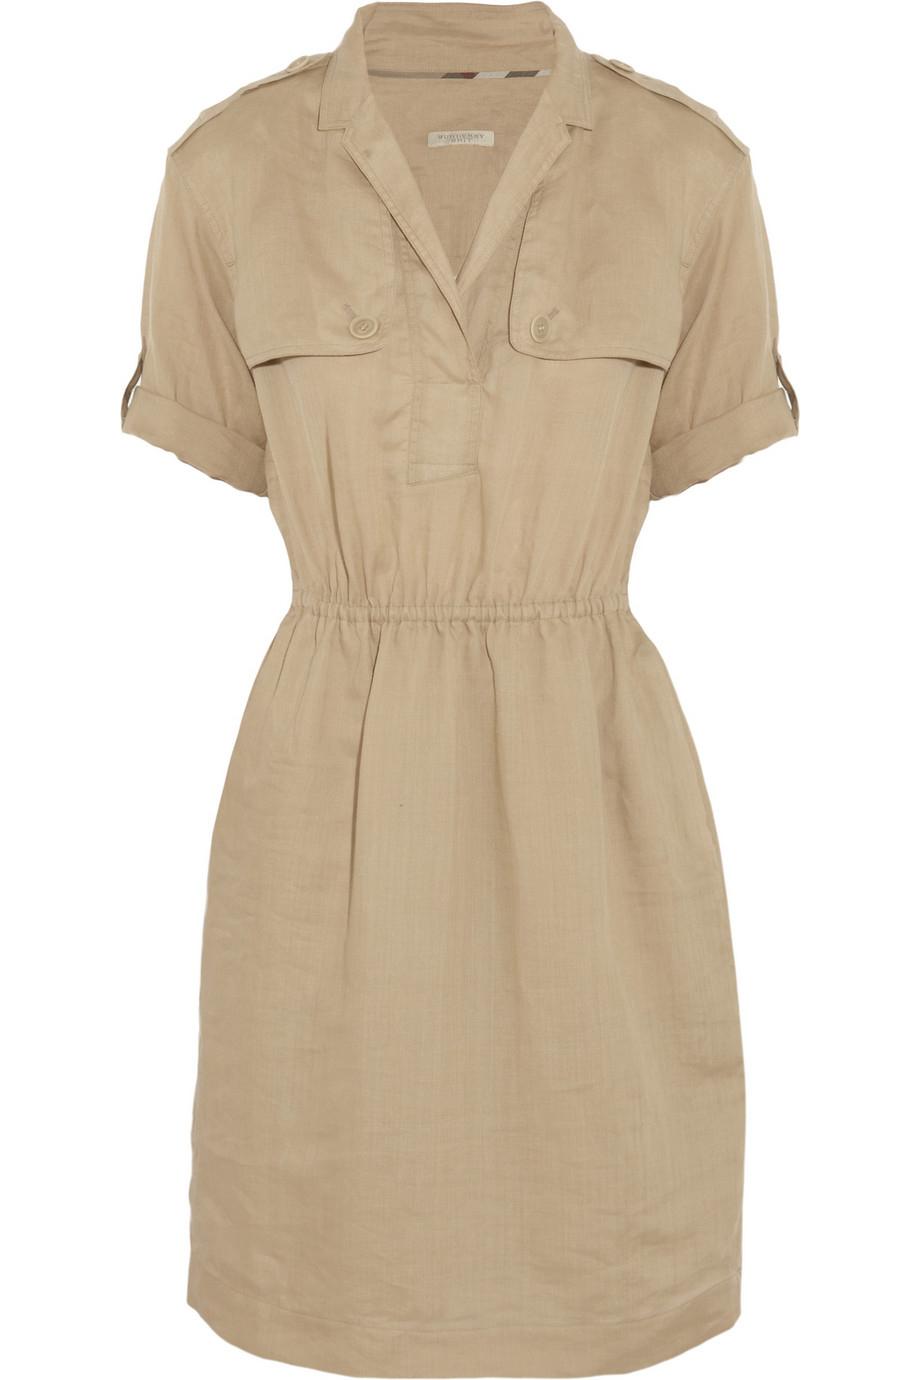 Lyst Burberry Brit Ramie Shirt Dress In Natural